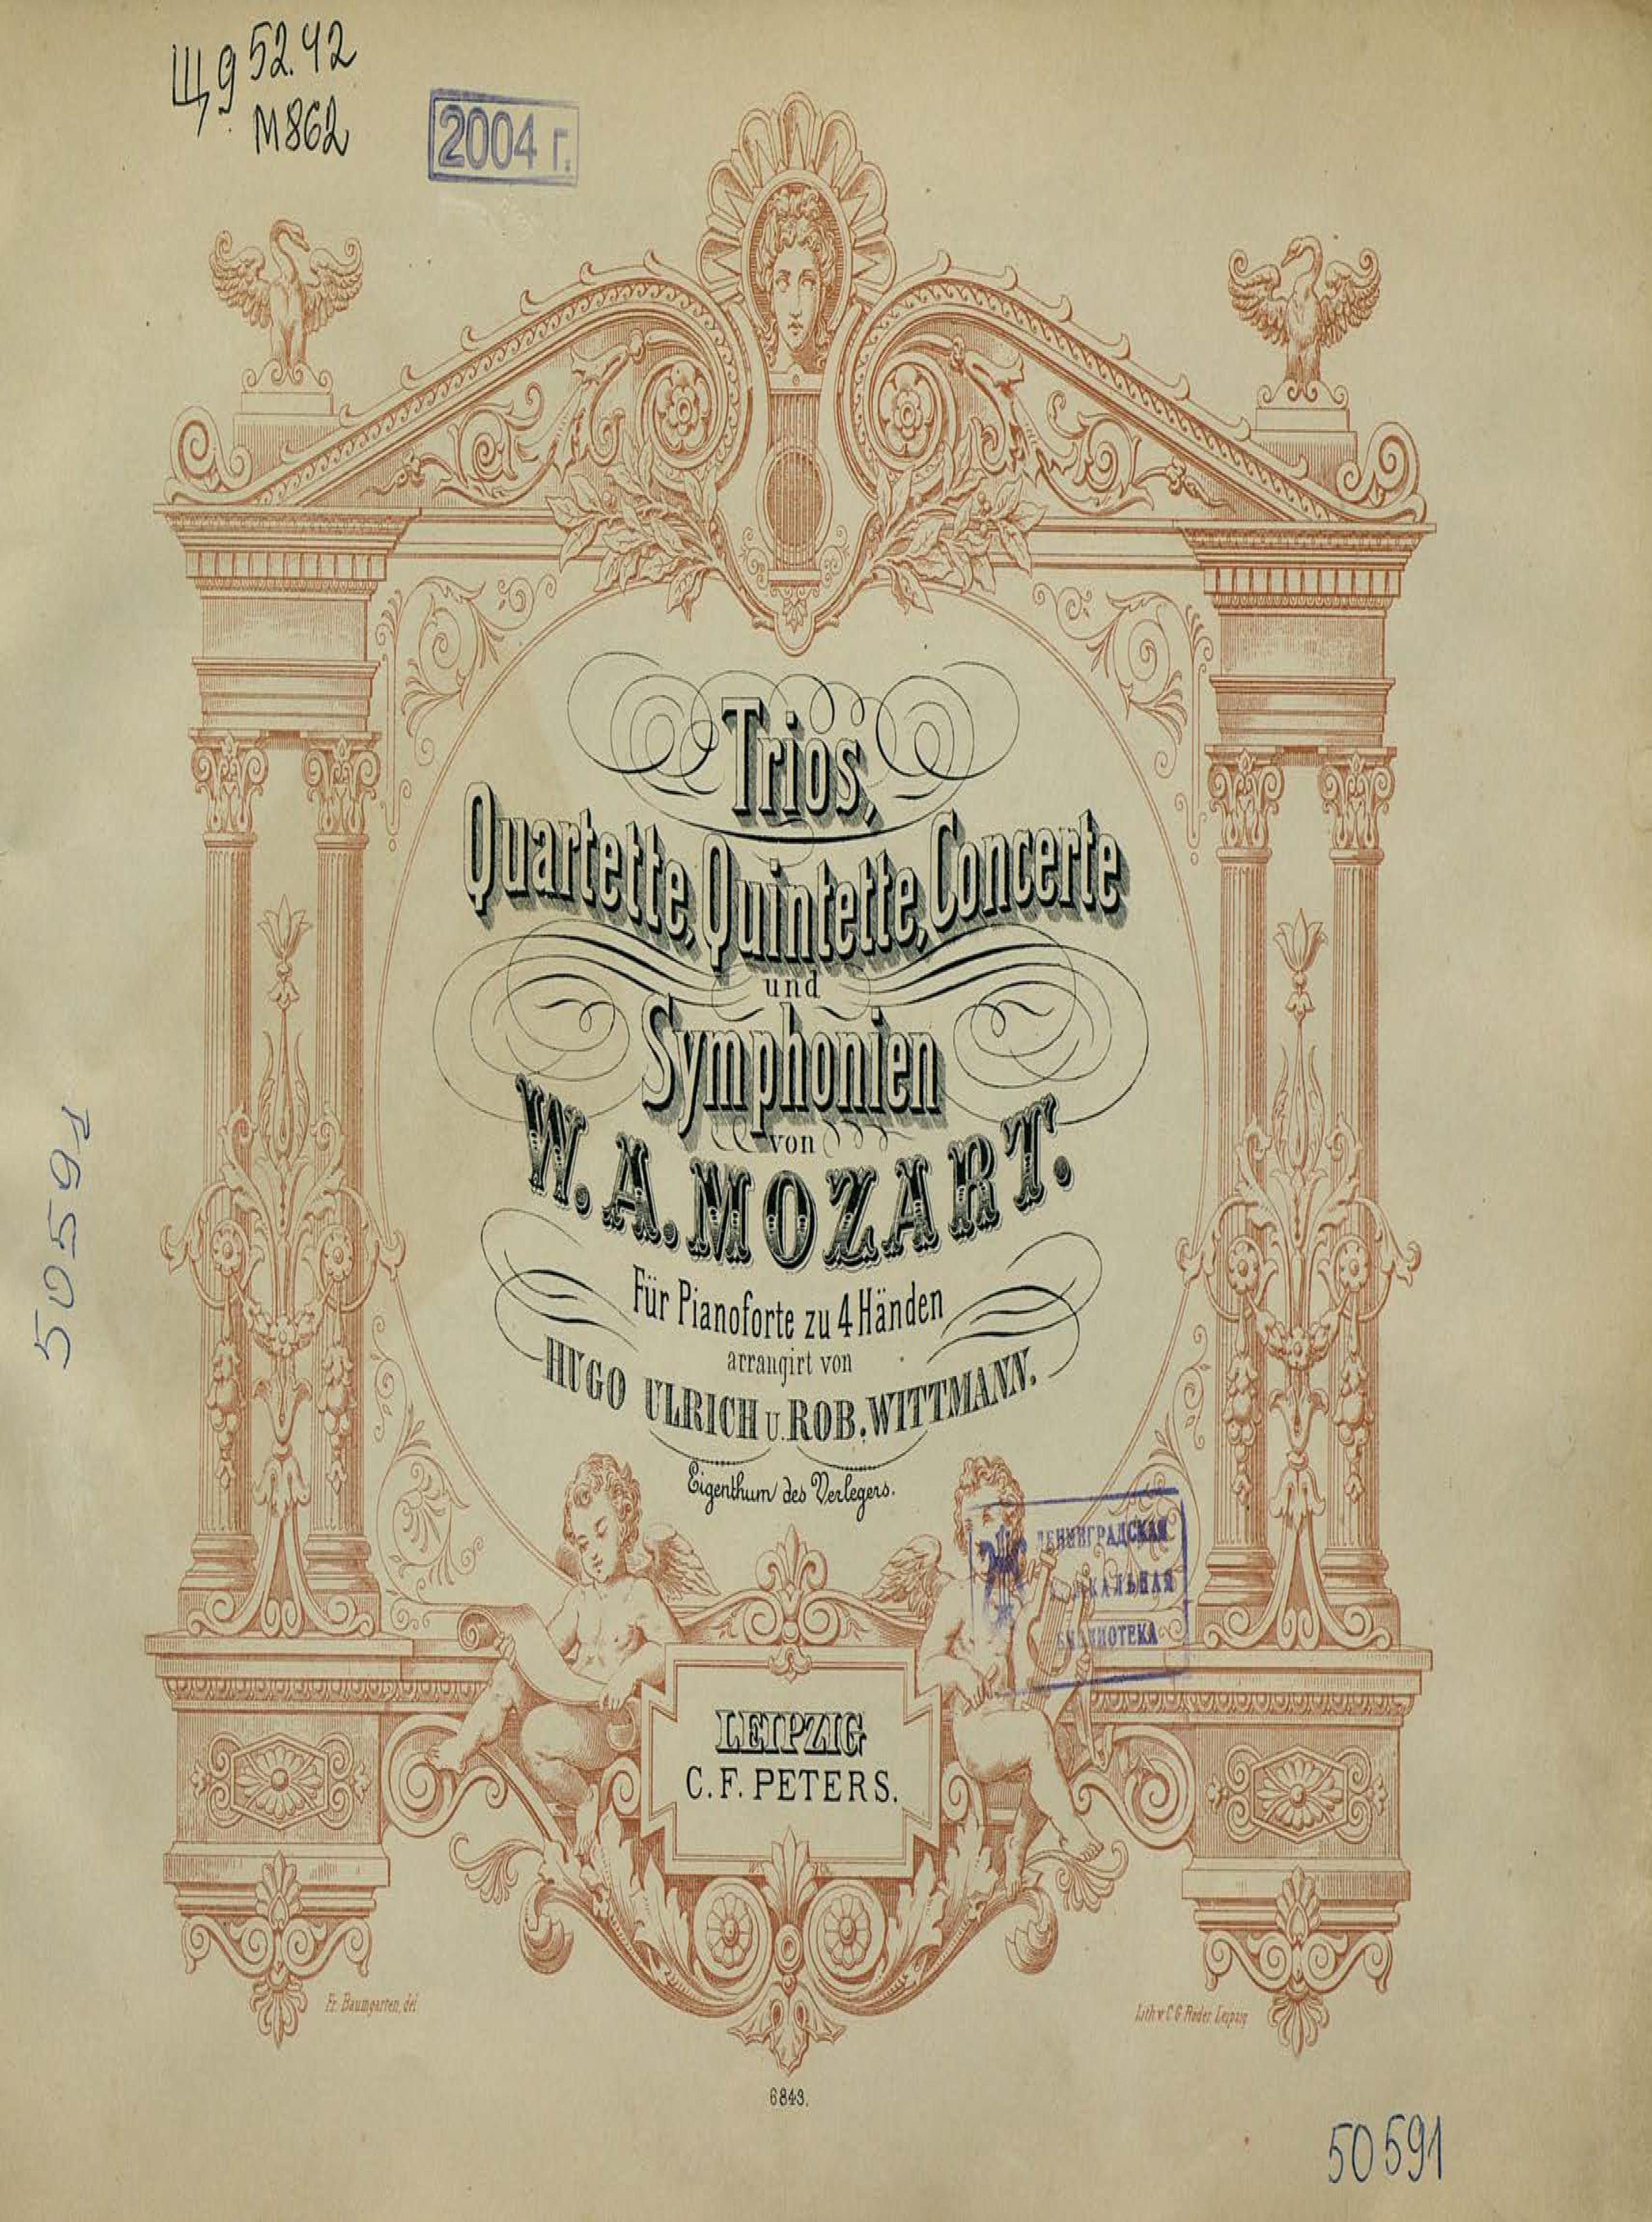 Вольфганг Амадей Моцарт Trios, Qartette, Quintette, Concerte und Symphonien von W. A. Mozart вольфганг амадей моцарт fantaisie ii in c mol pour piano a 2 mains